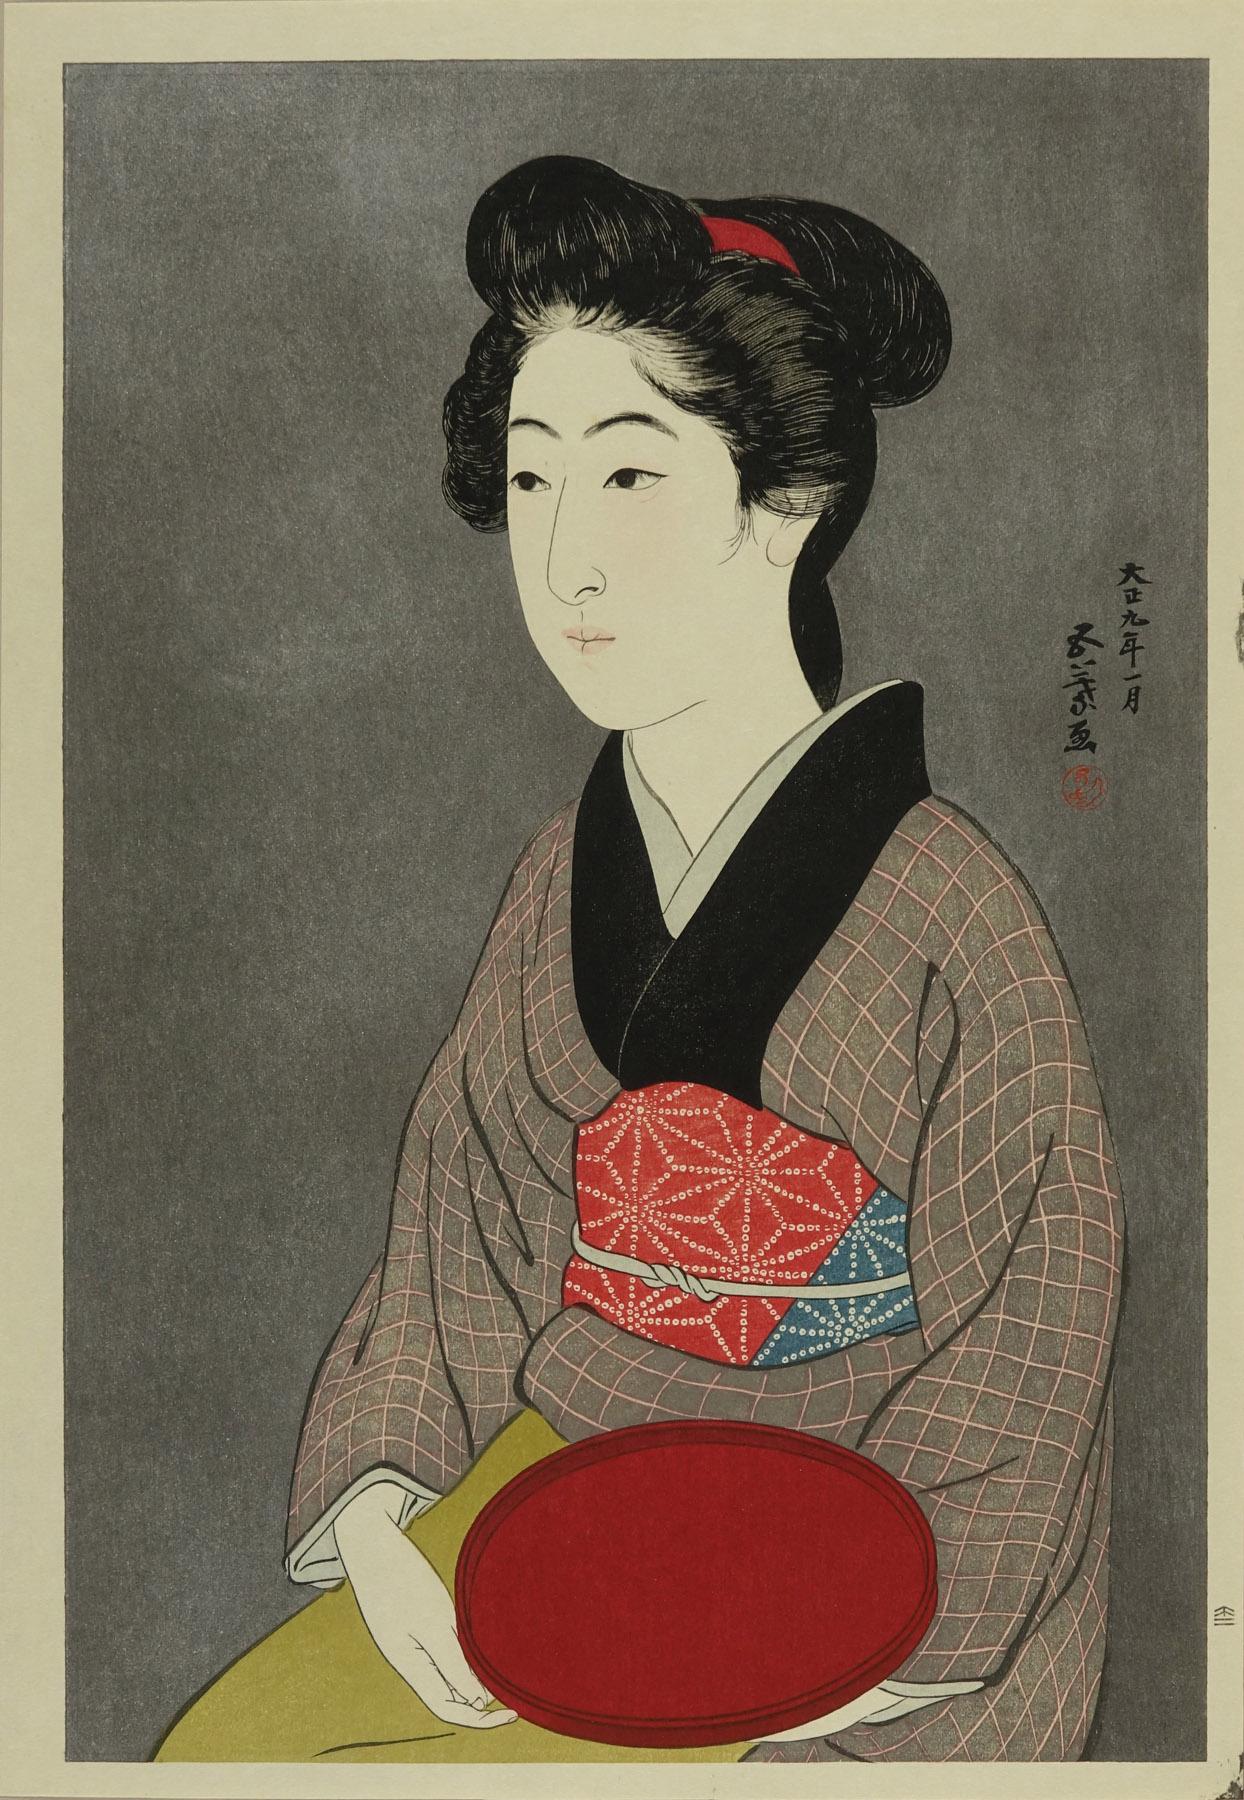 HASHIGUCHI GOYO Bon moteru onna (Roman holding a tray): after Hashiguchi Goyo, hand-printed woodcut reproduction, published by Yuyudo, 41x28.5cm., matted